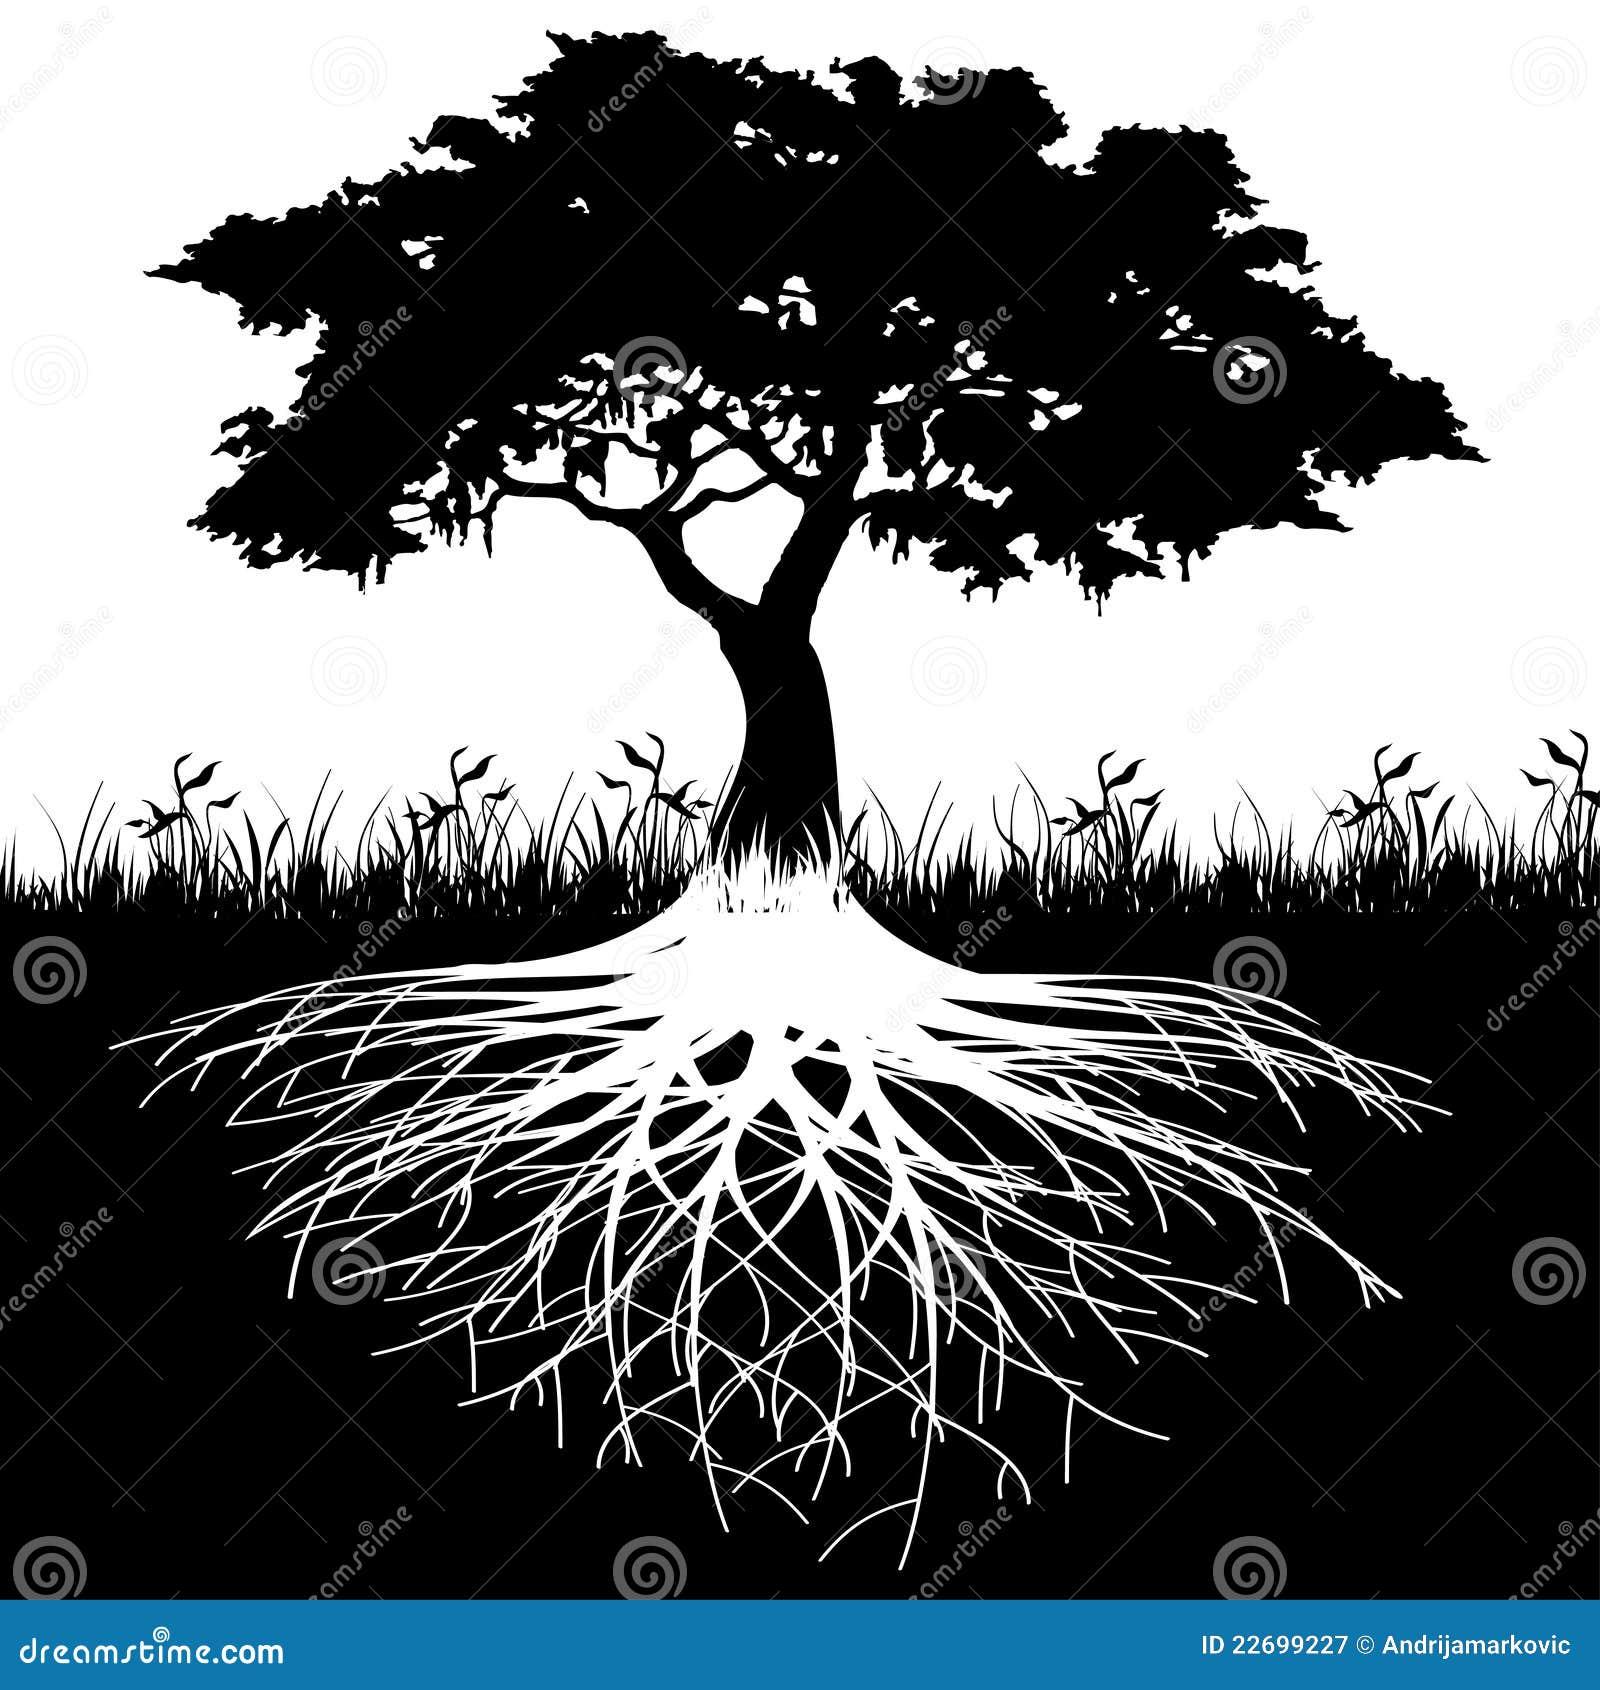 El árbol arraiga la silueta